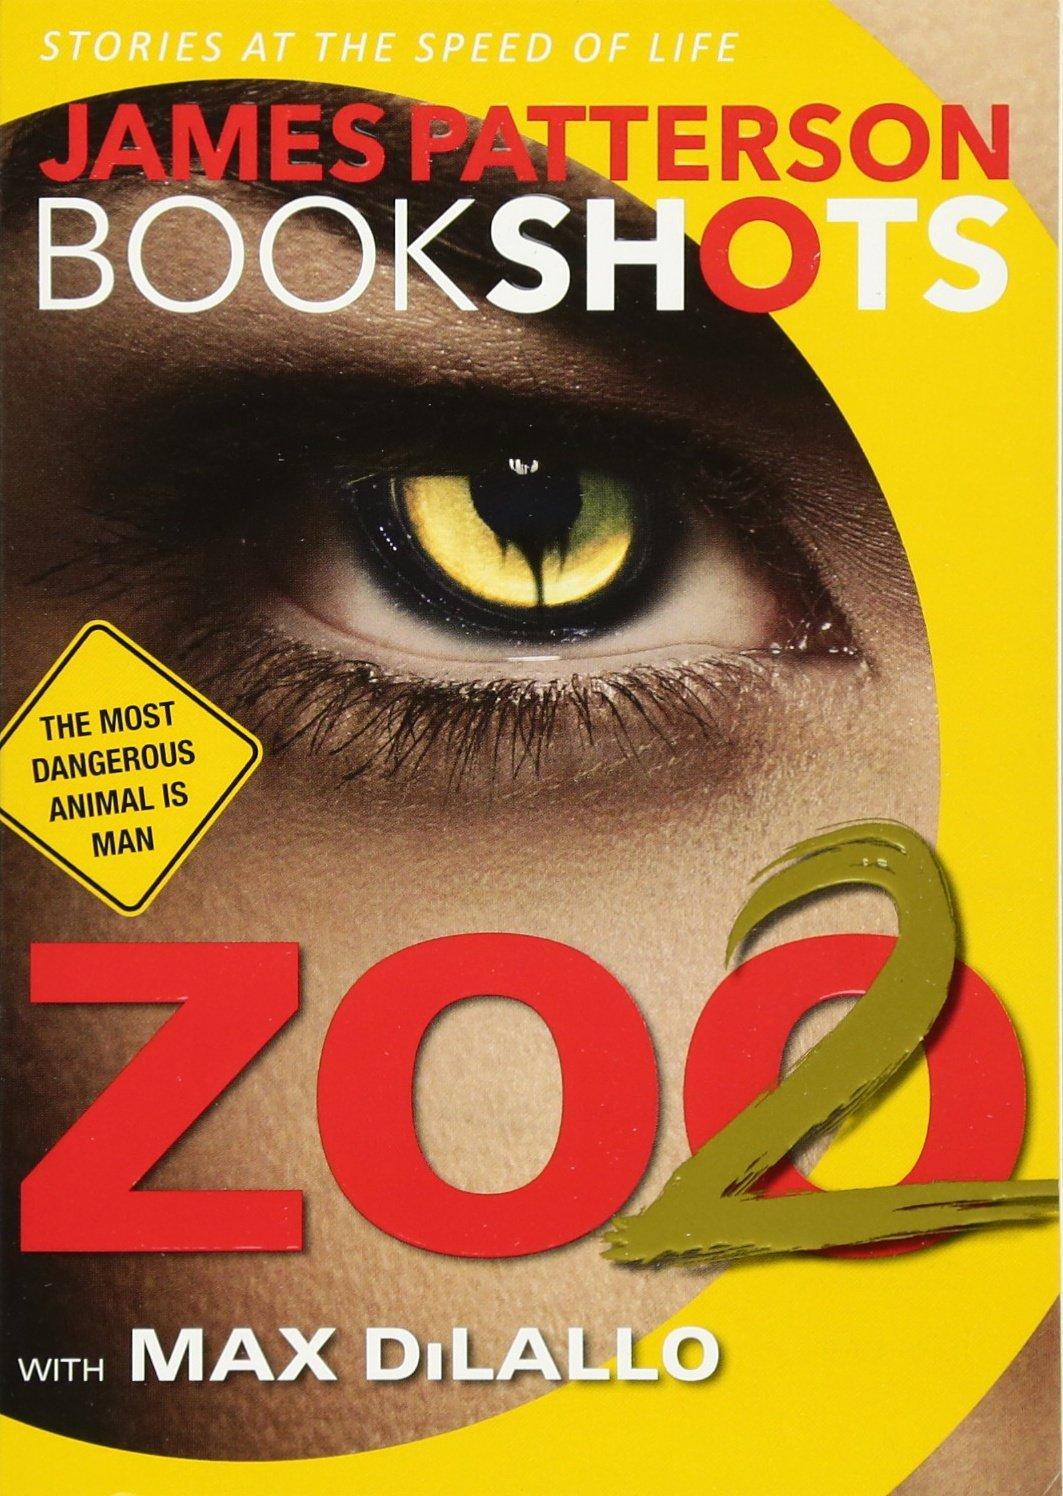 Zoo 2 BookShots James Patterson product image